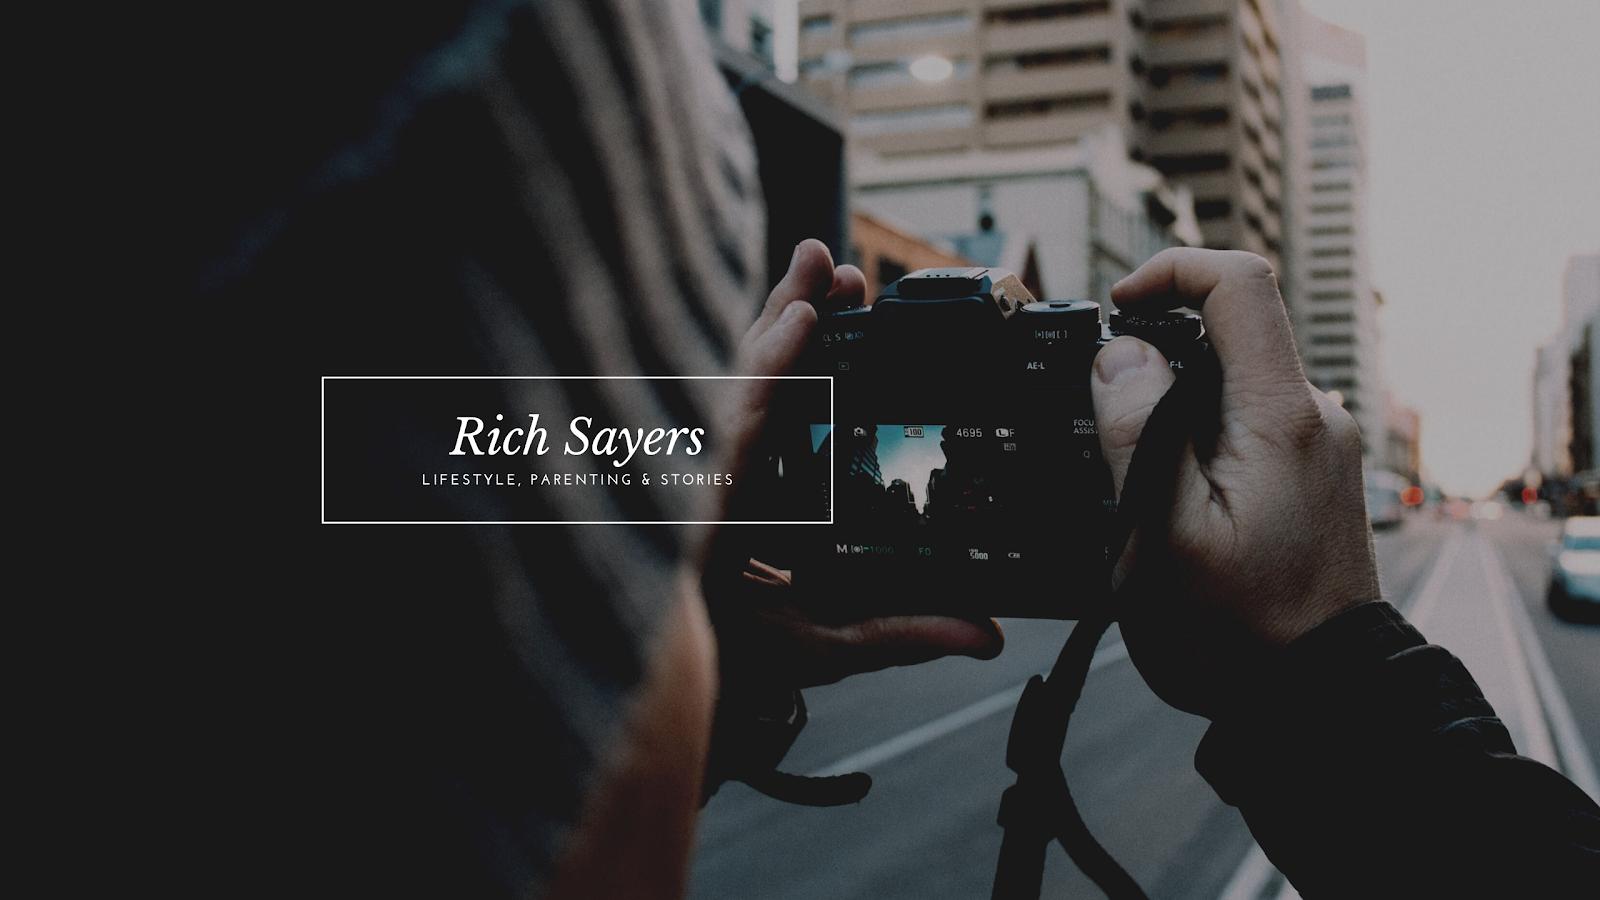 Rich Sayers